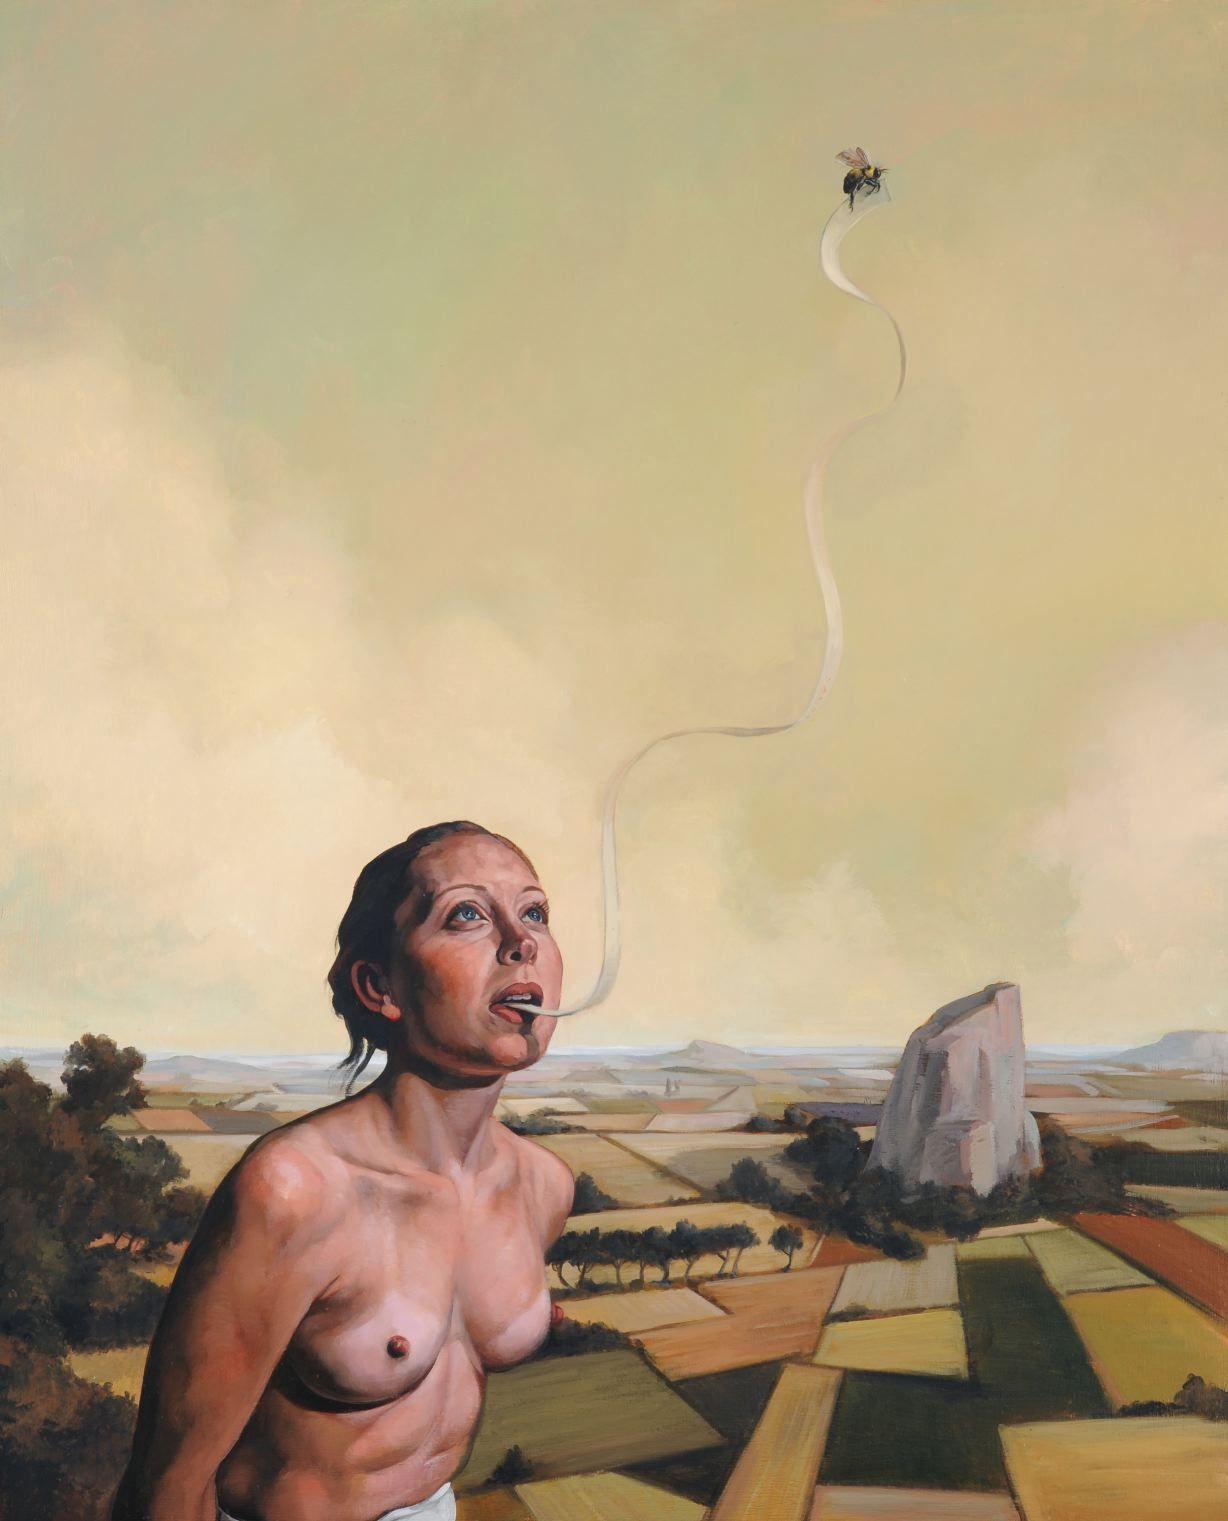 ERIK THOR SANDBERG  Eloquence  2009, oil on canvas, 30 x 24 inches.